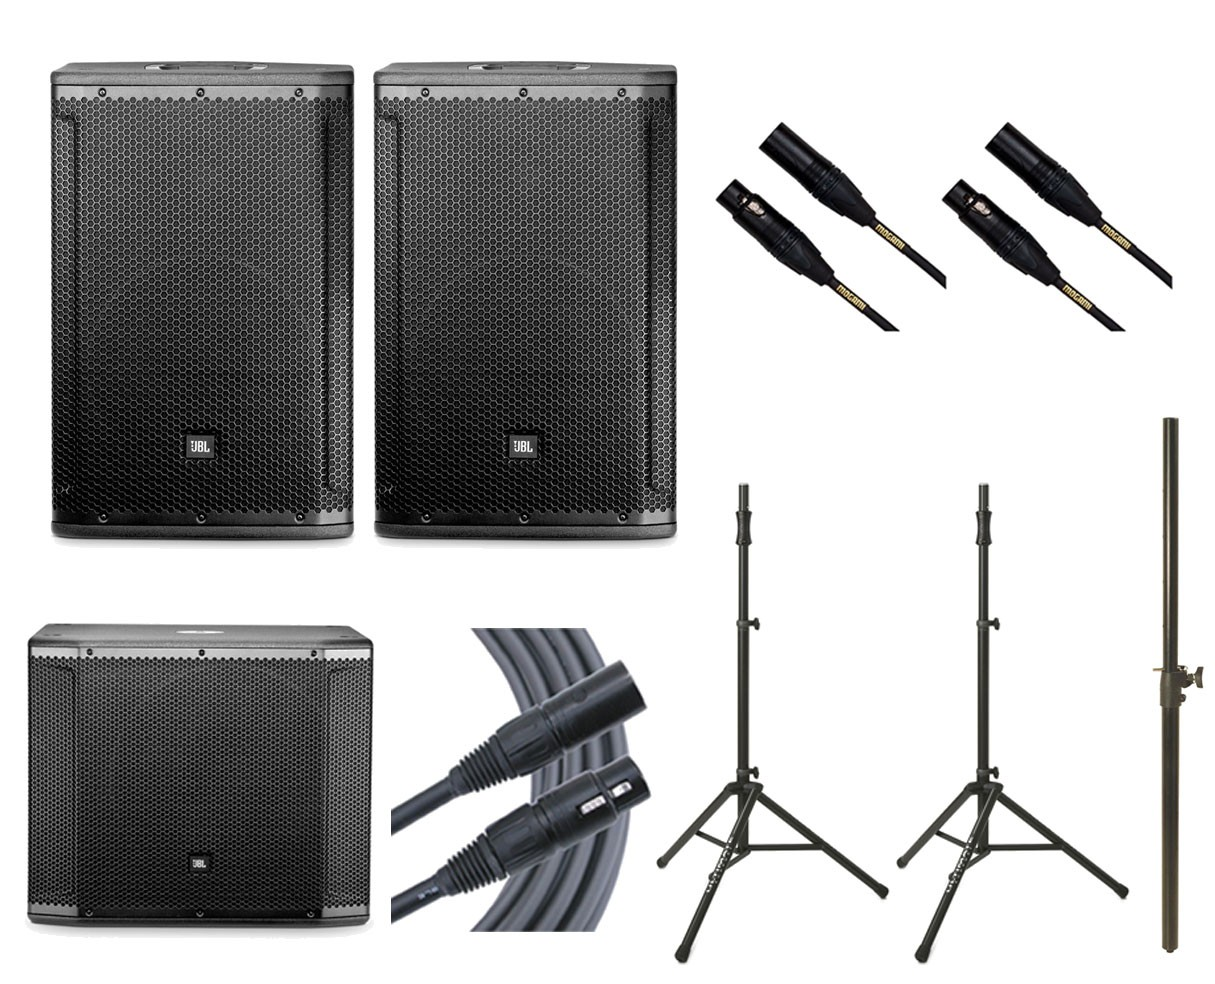 2x JBL SRX812P + JBL SRX818SP + 2x Ultimate TS-100B + Mogami Cables + Pole